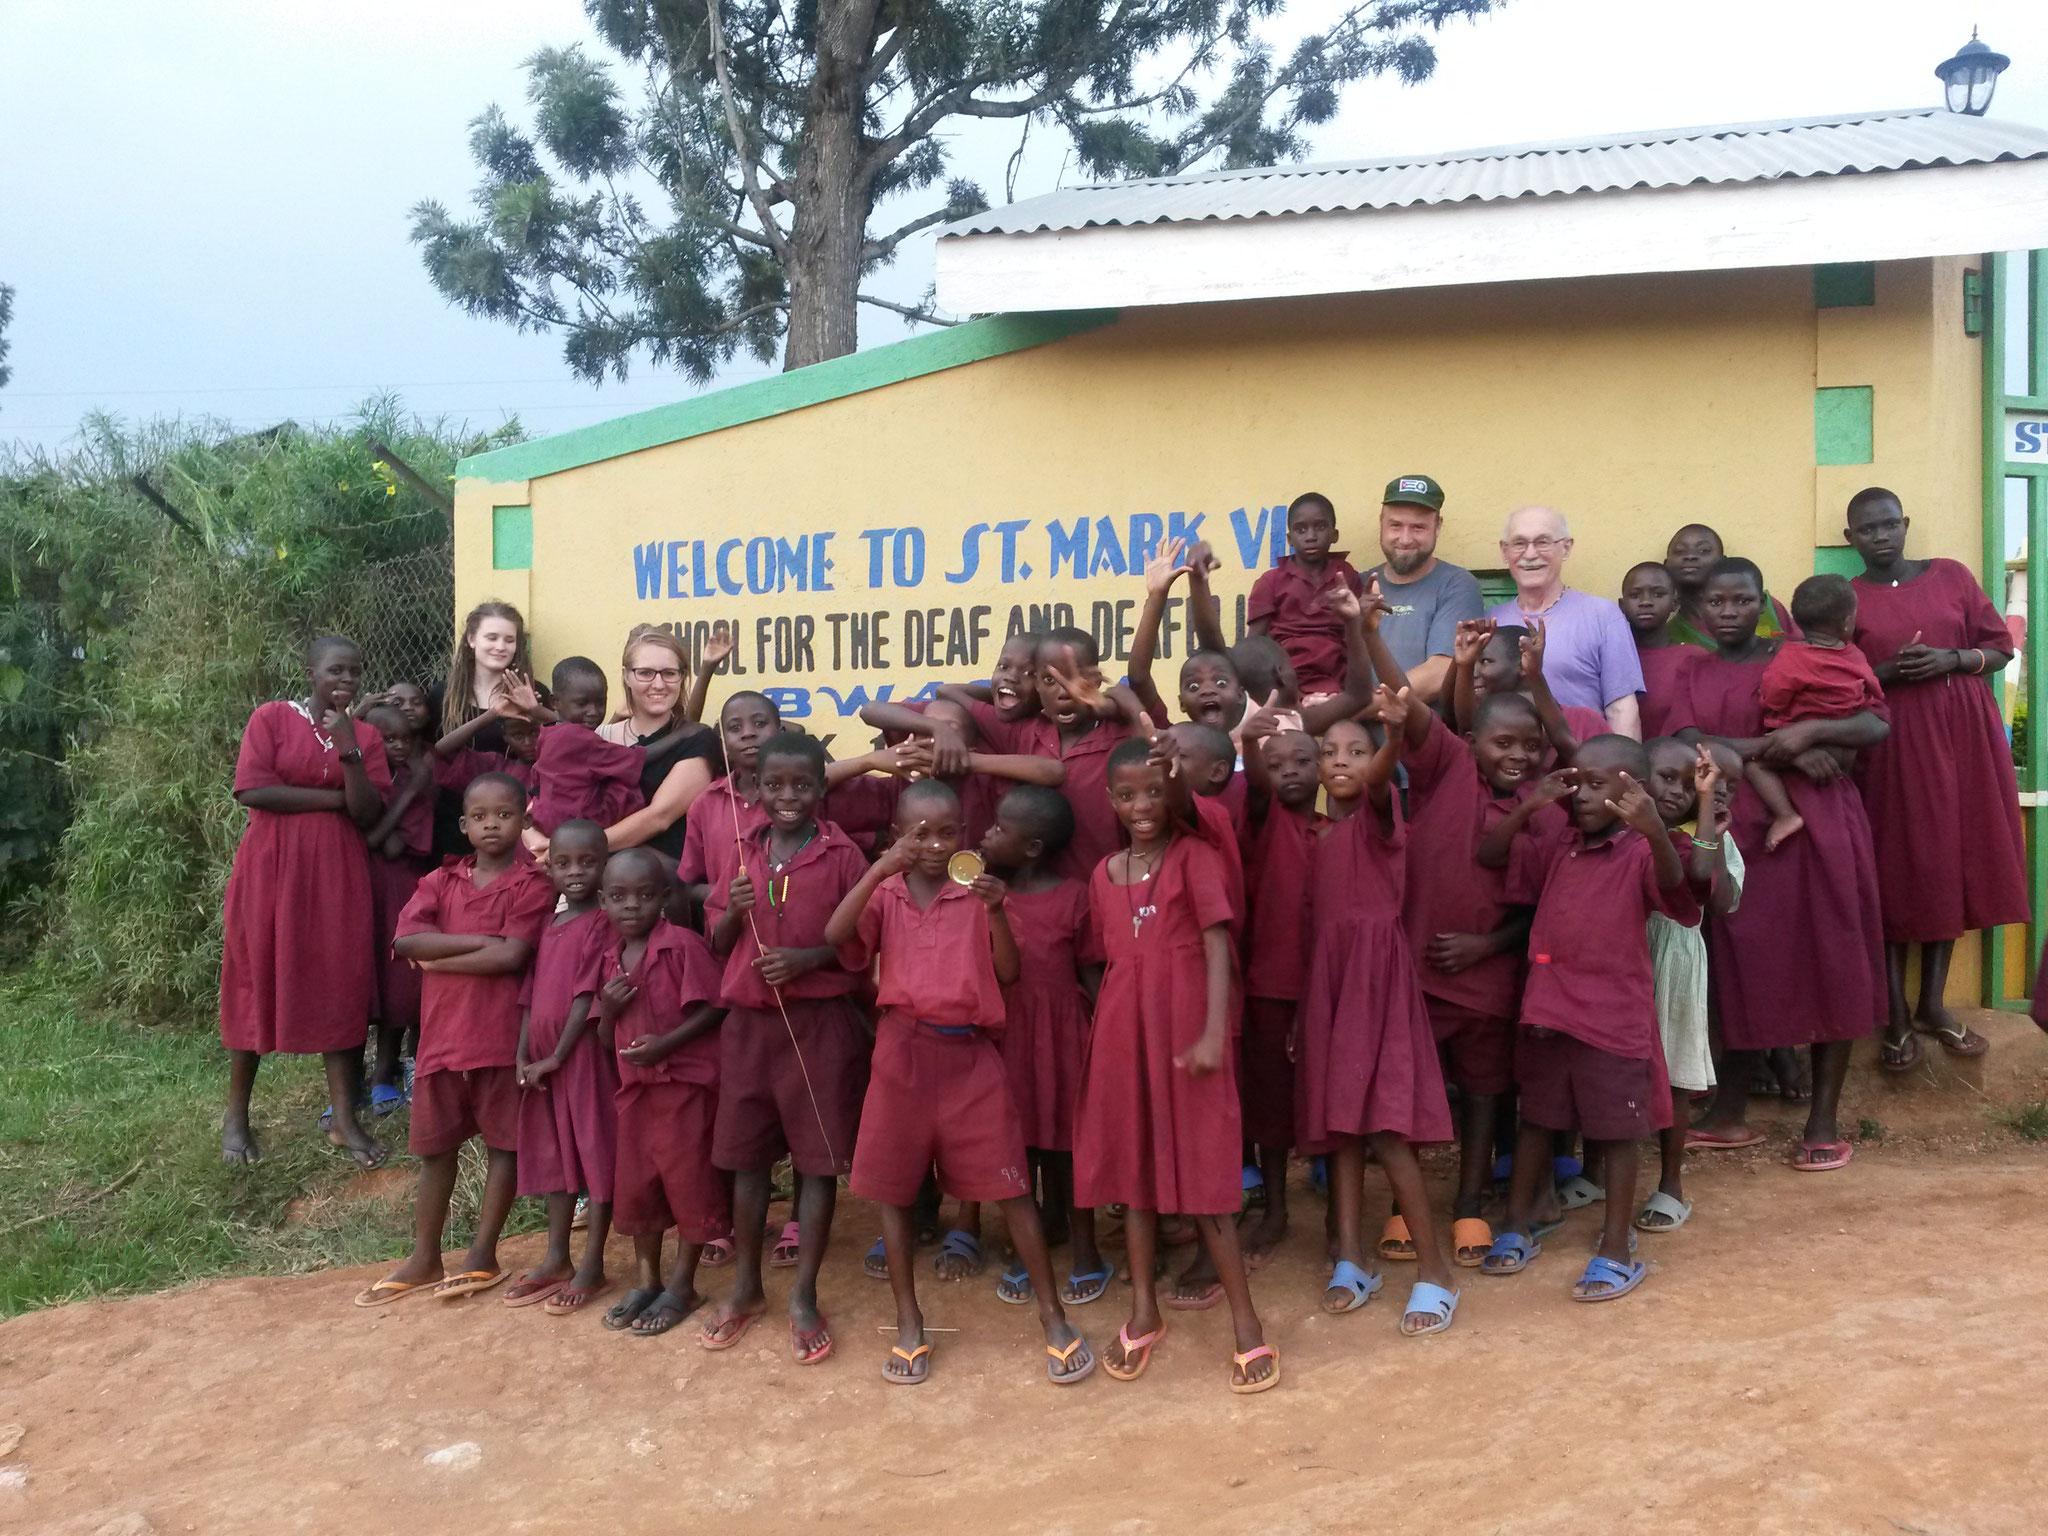 Gruppenfoto in Bwanda